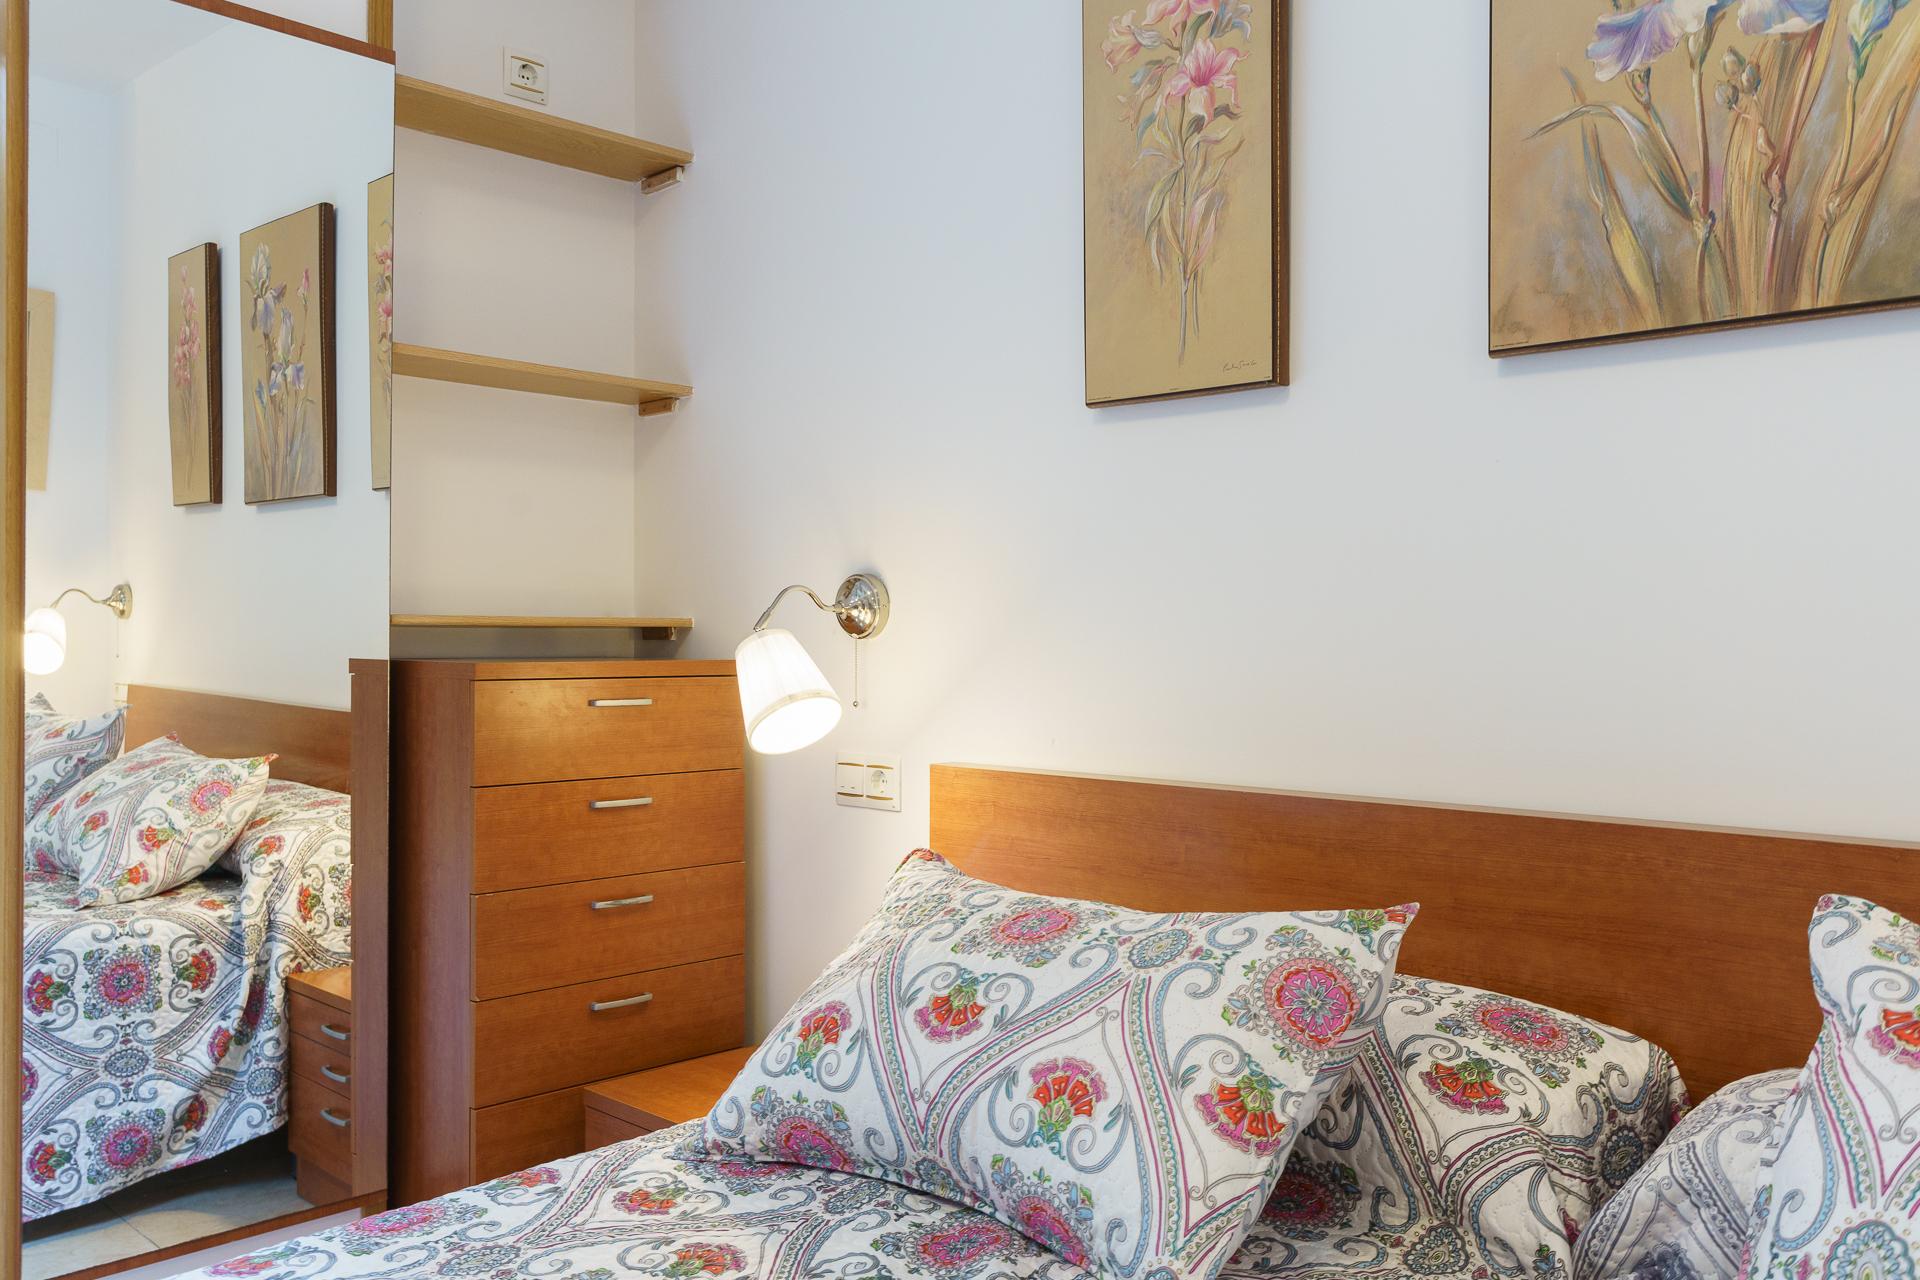 Apartment MalagaSuite Studio on the Beach photo 21409879